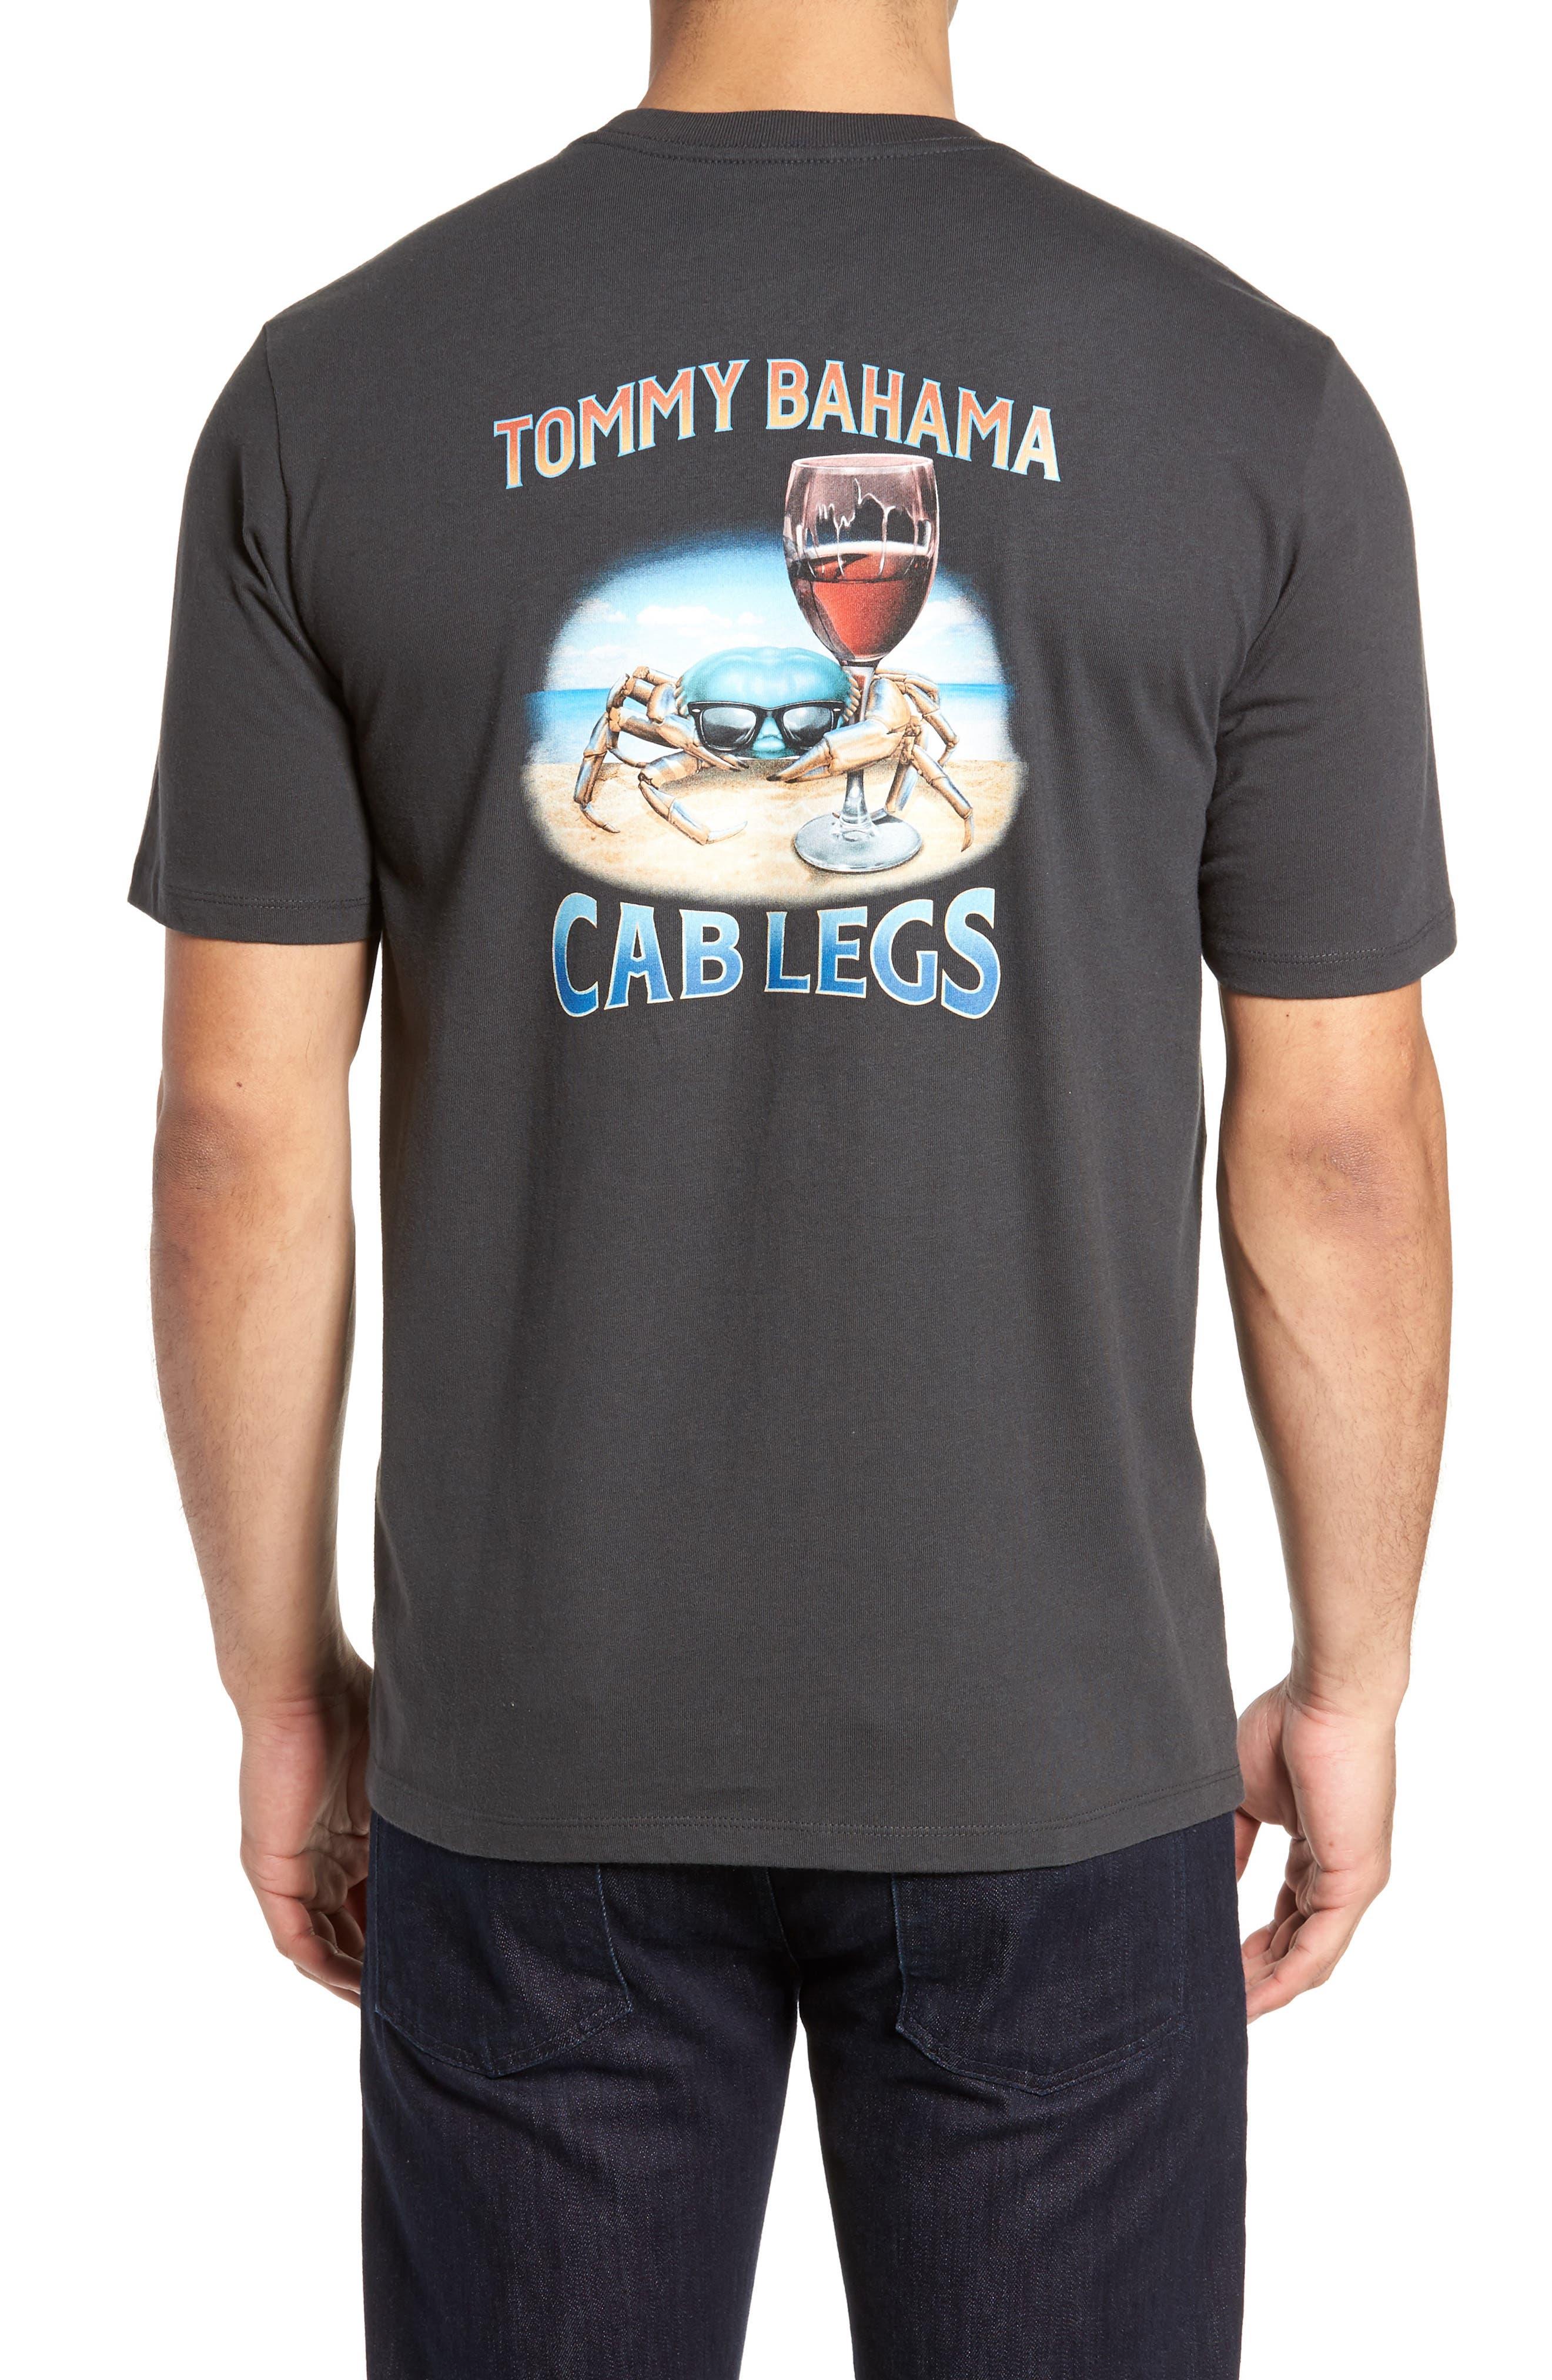 Cab Legs Graphic T-Shirt,                             Alternate thumbnail 2, color,                             Coal